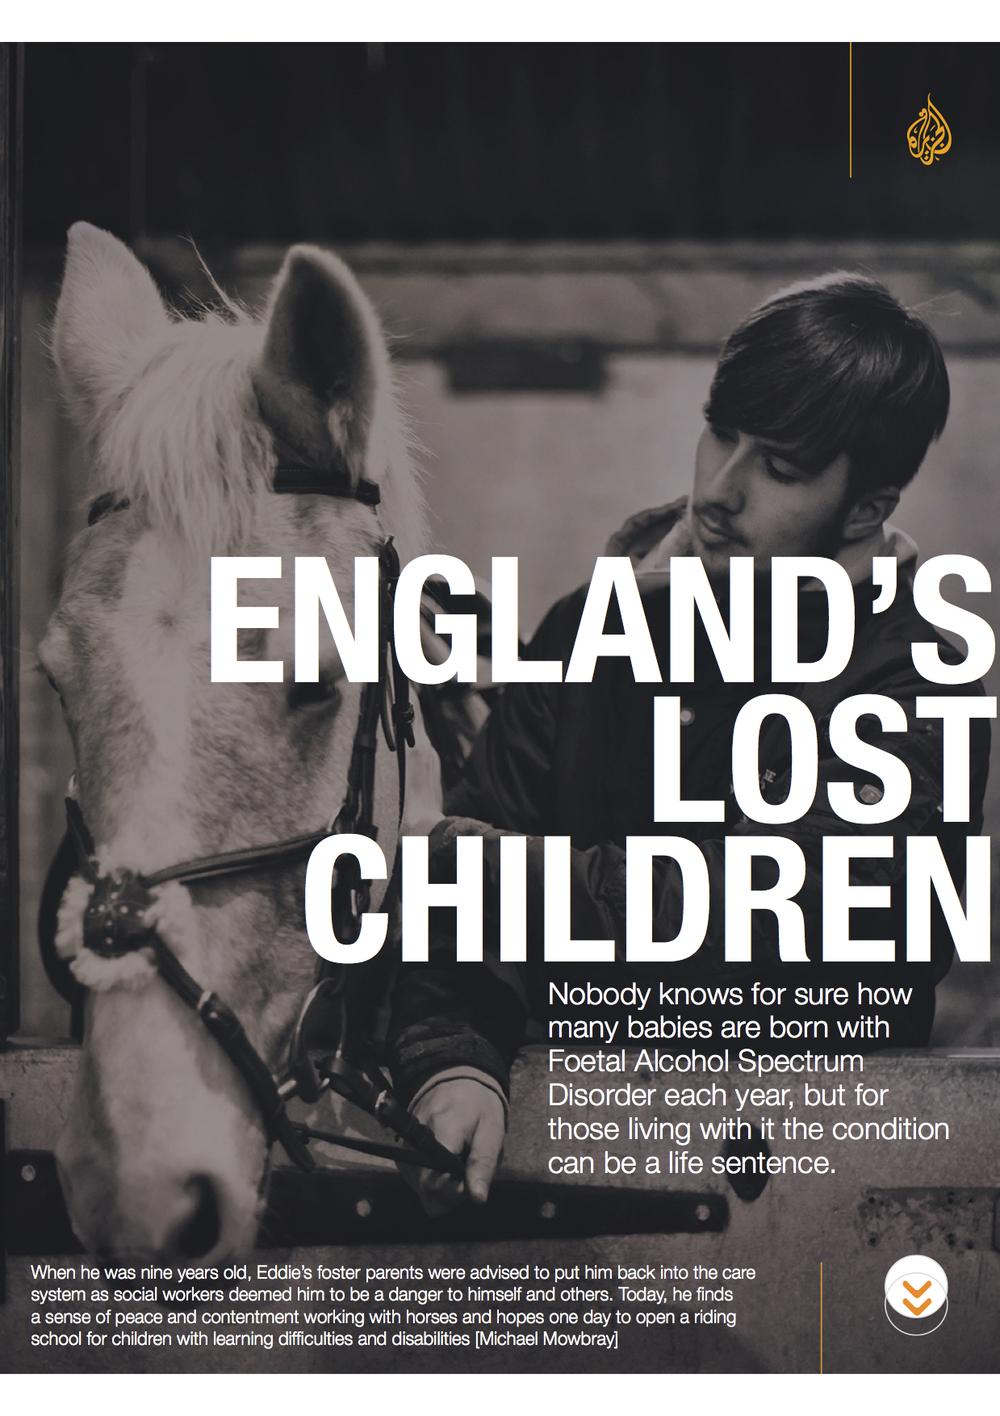 Al Jazeera Magazine (ENGLAND'S LOST CHILDREN).jpg